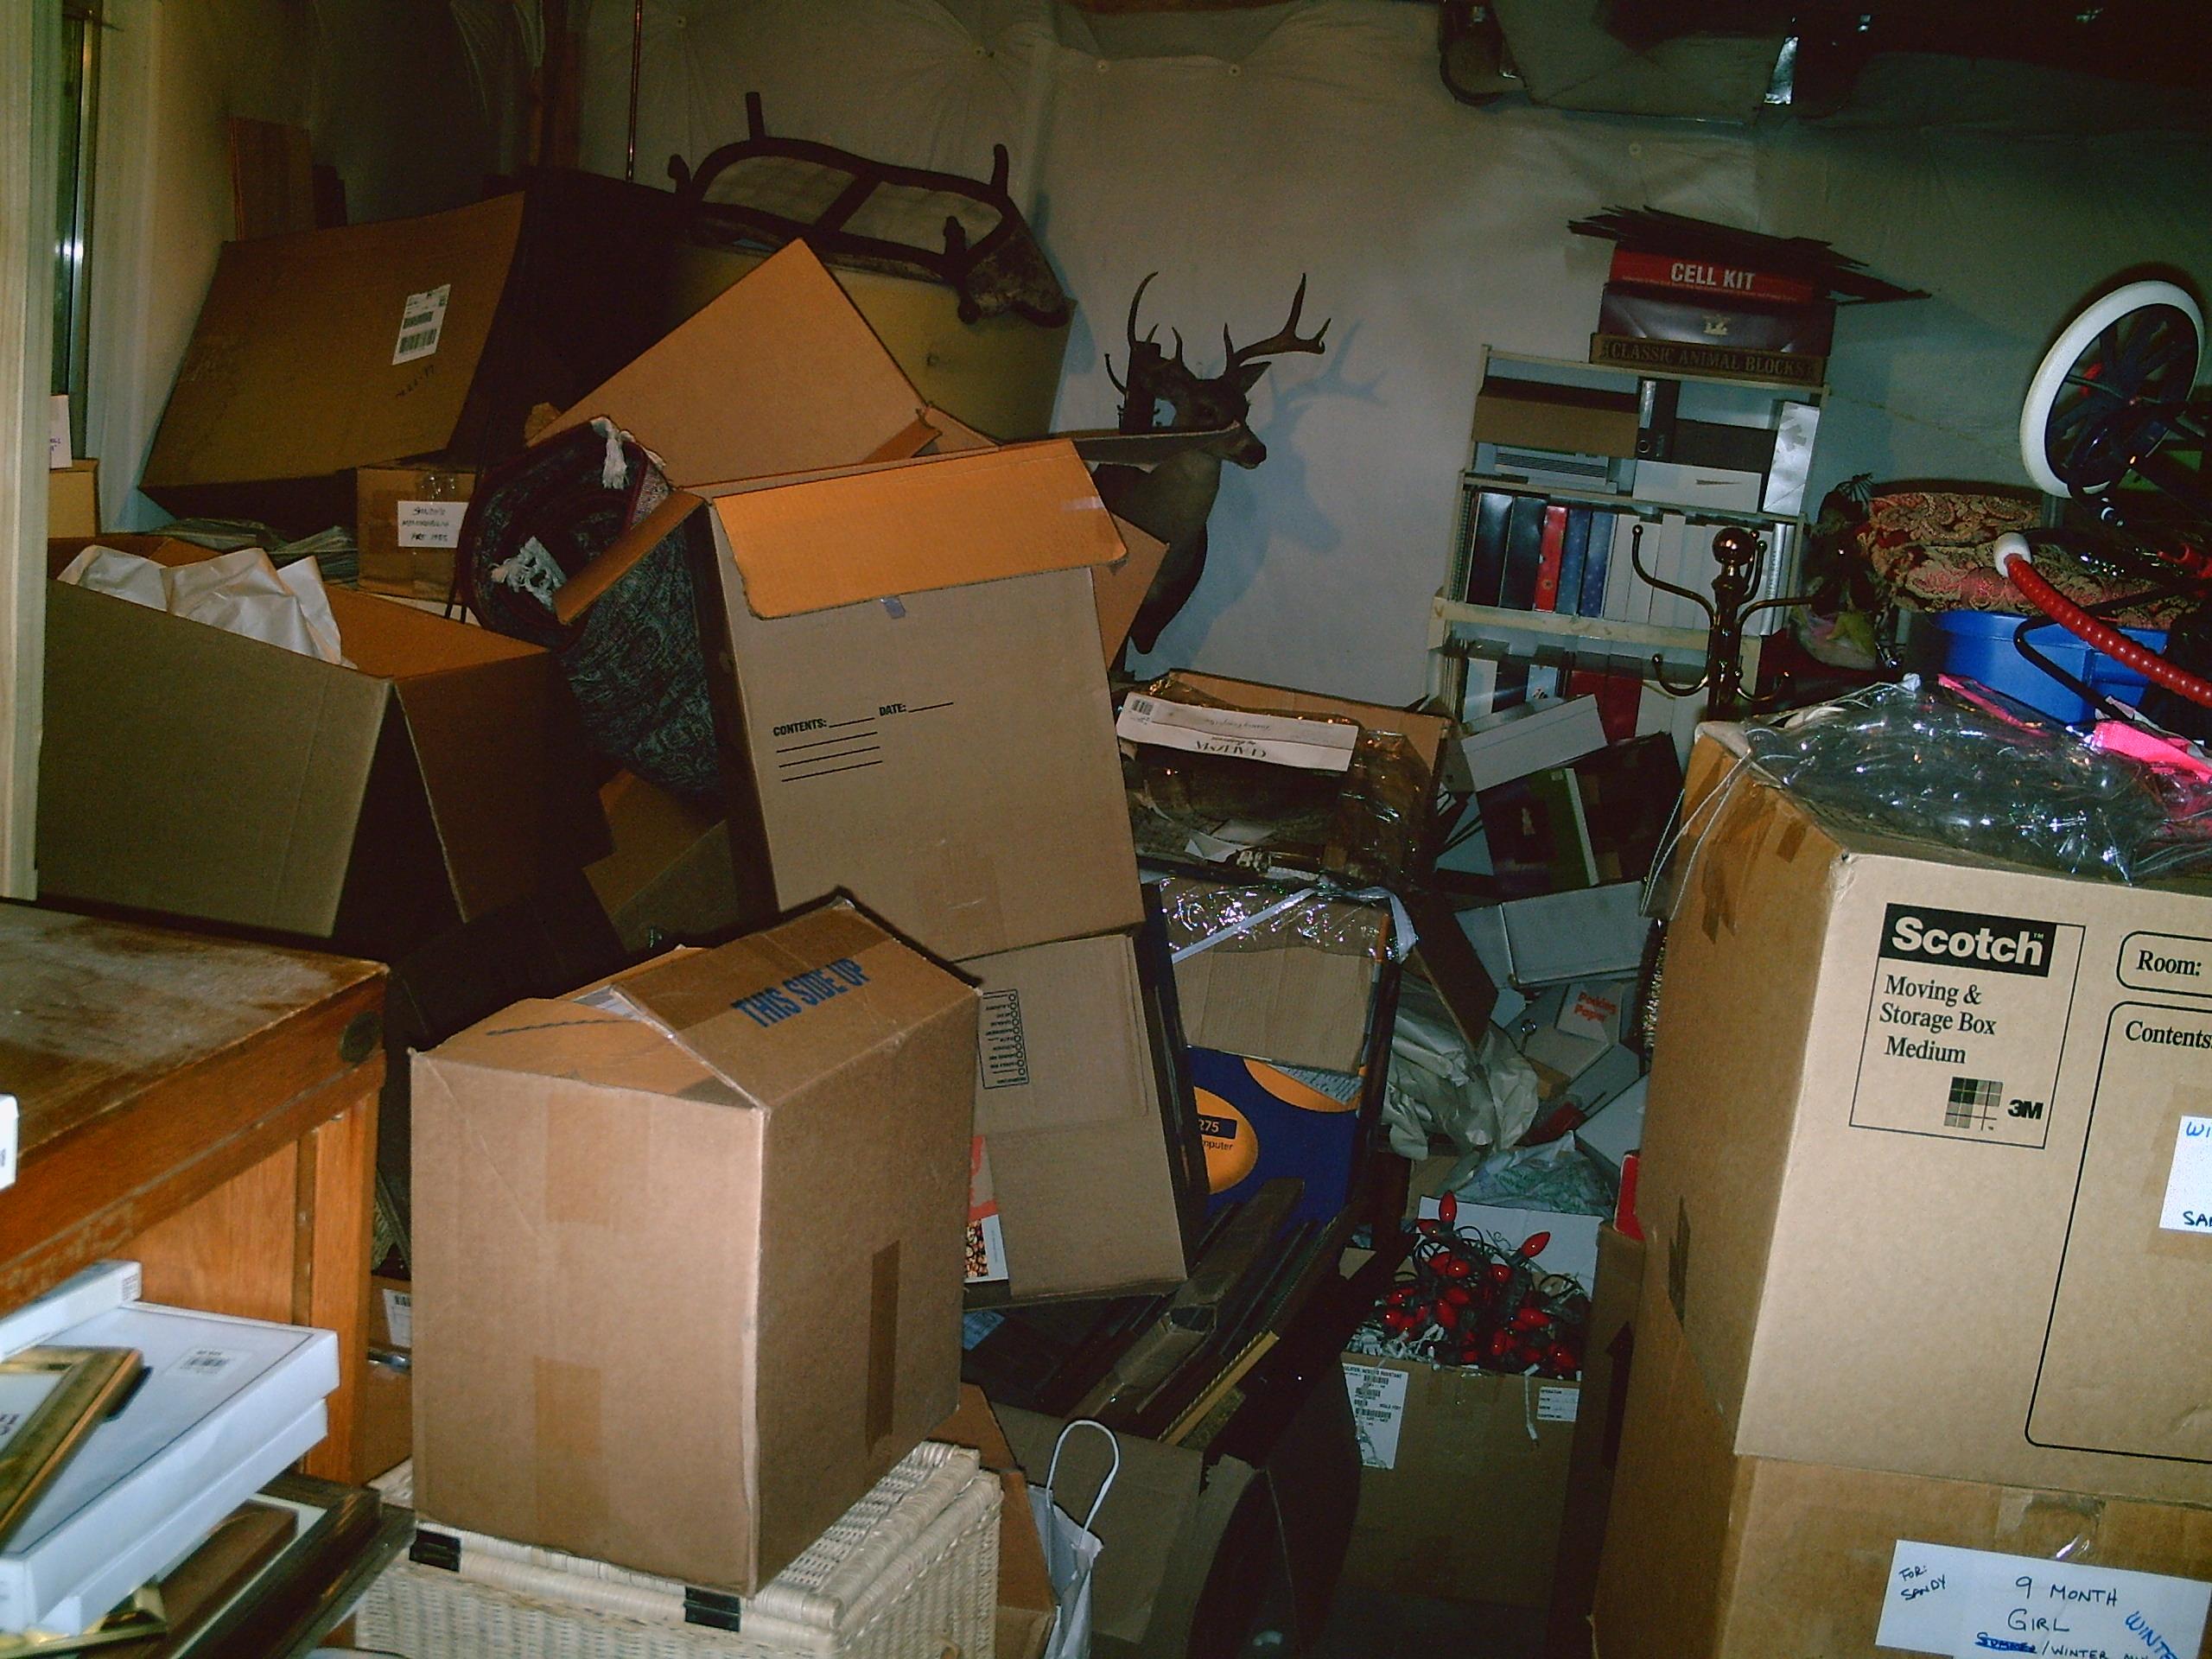 (photo credit: DrDeClutterBlog.com)